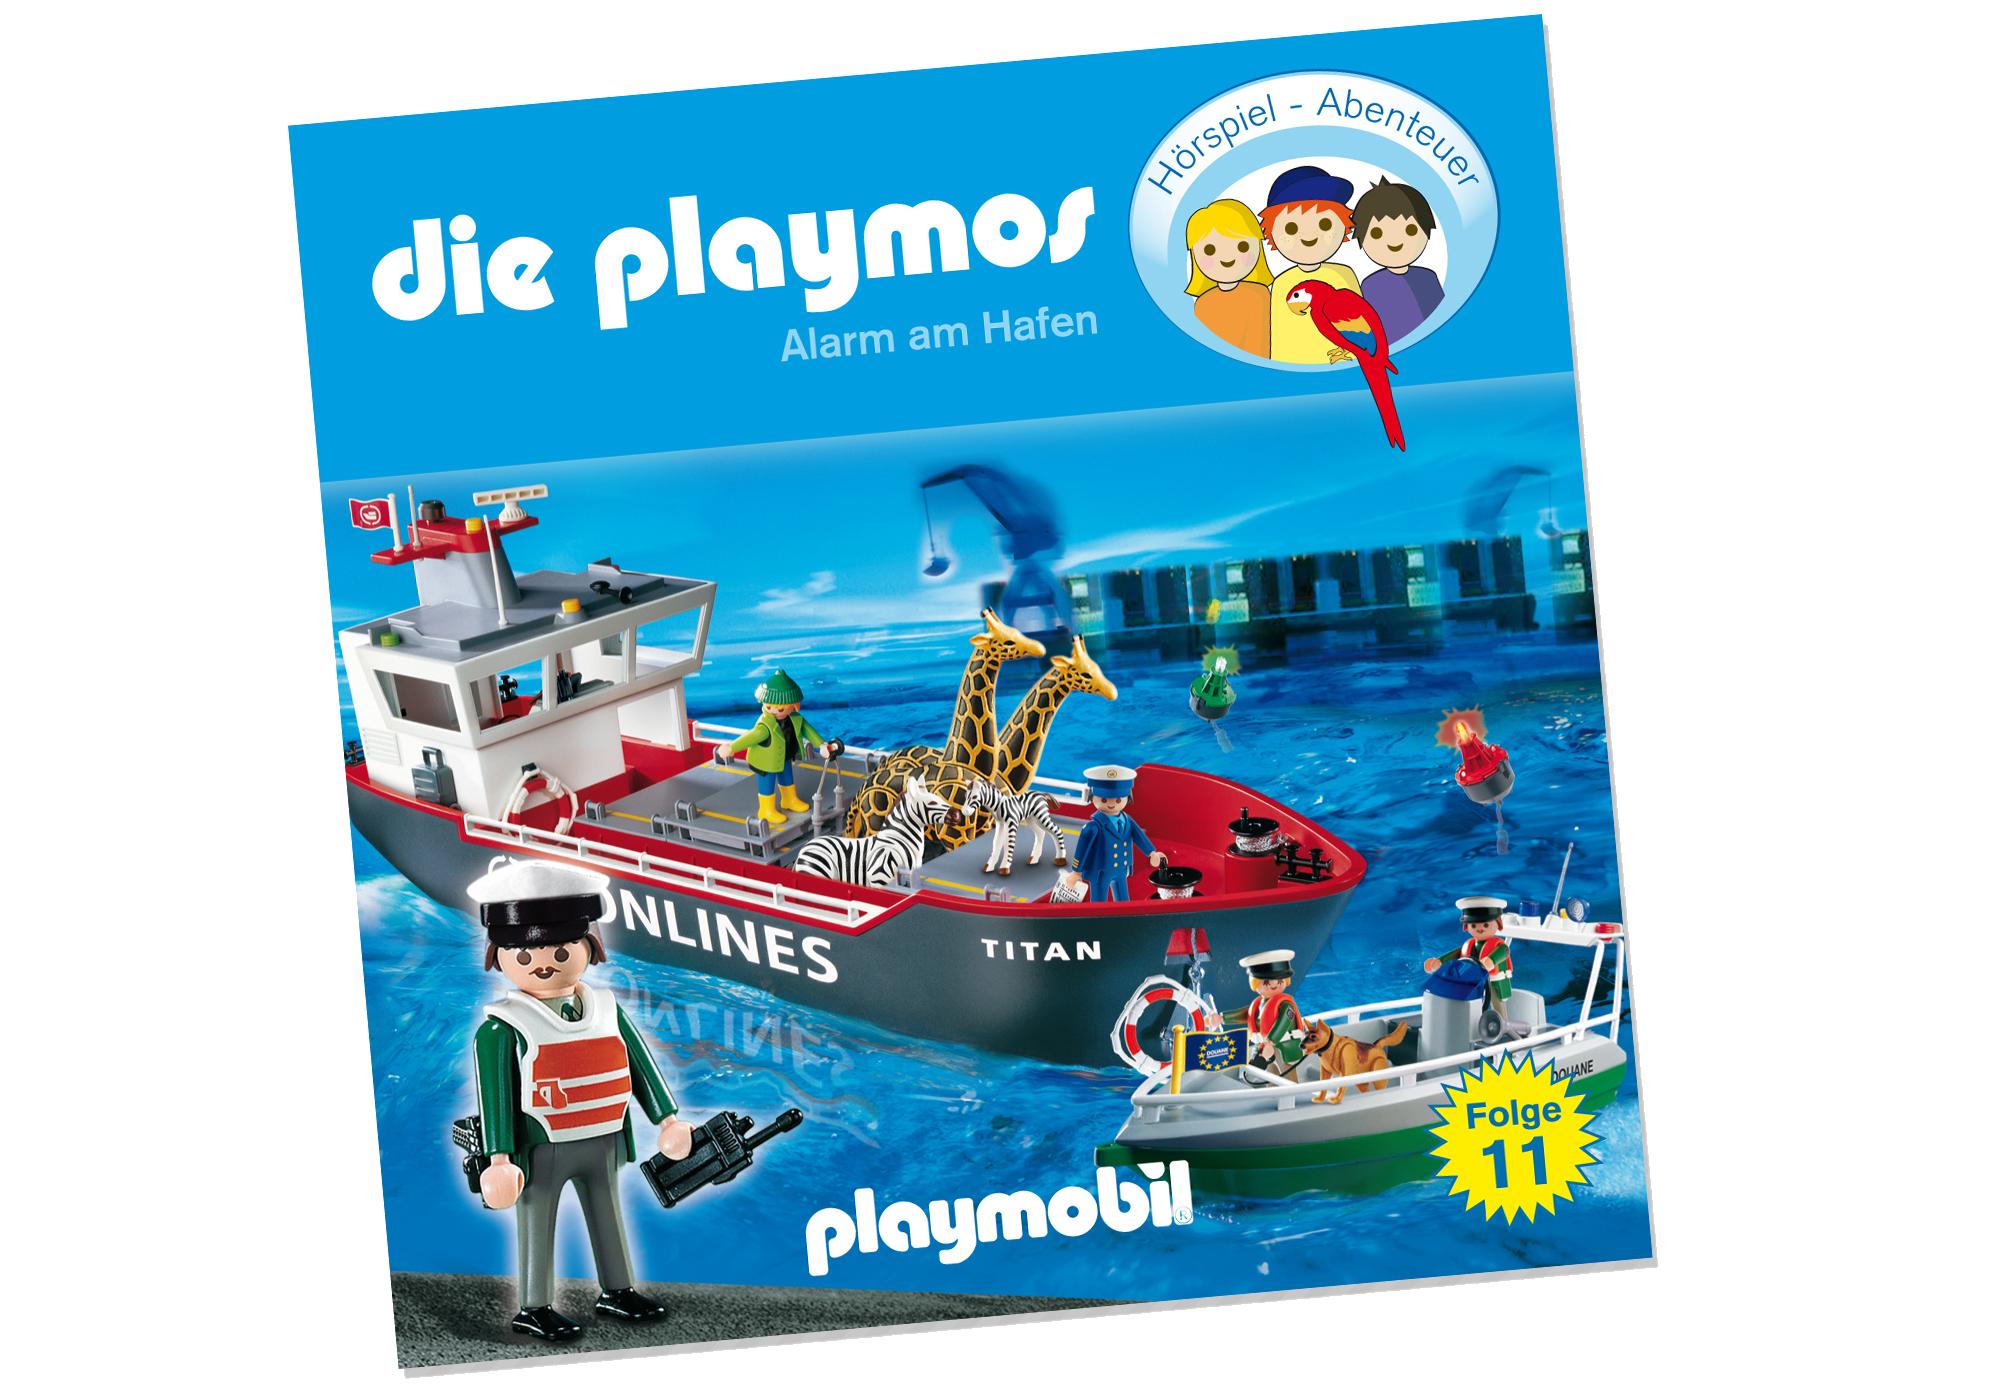 http://media.playmobil.com/i/playmobil/80198_product_detail/Alarm im Hafen (11) - CD